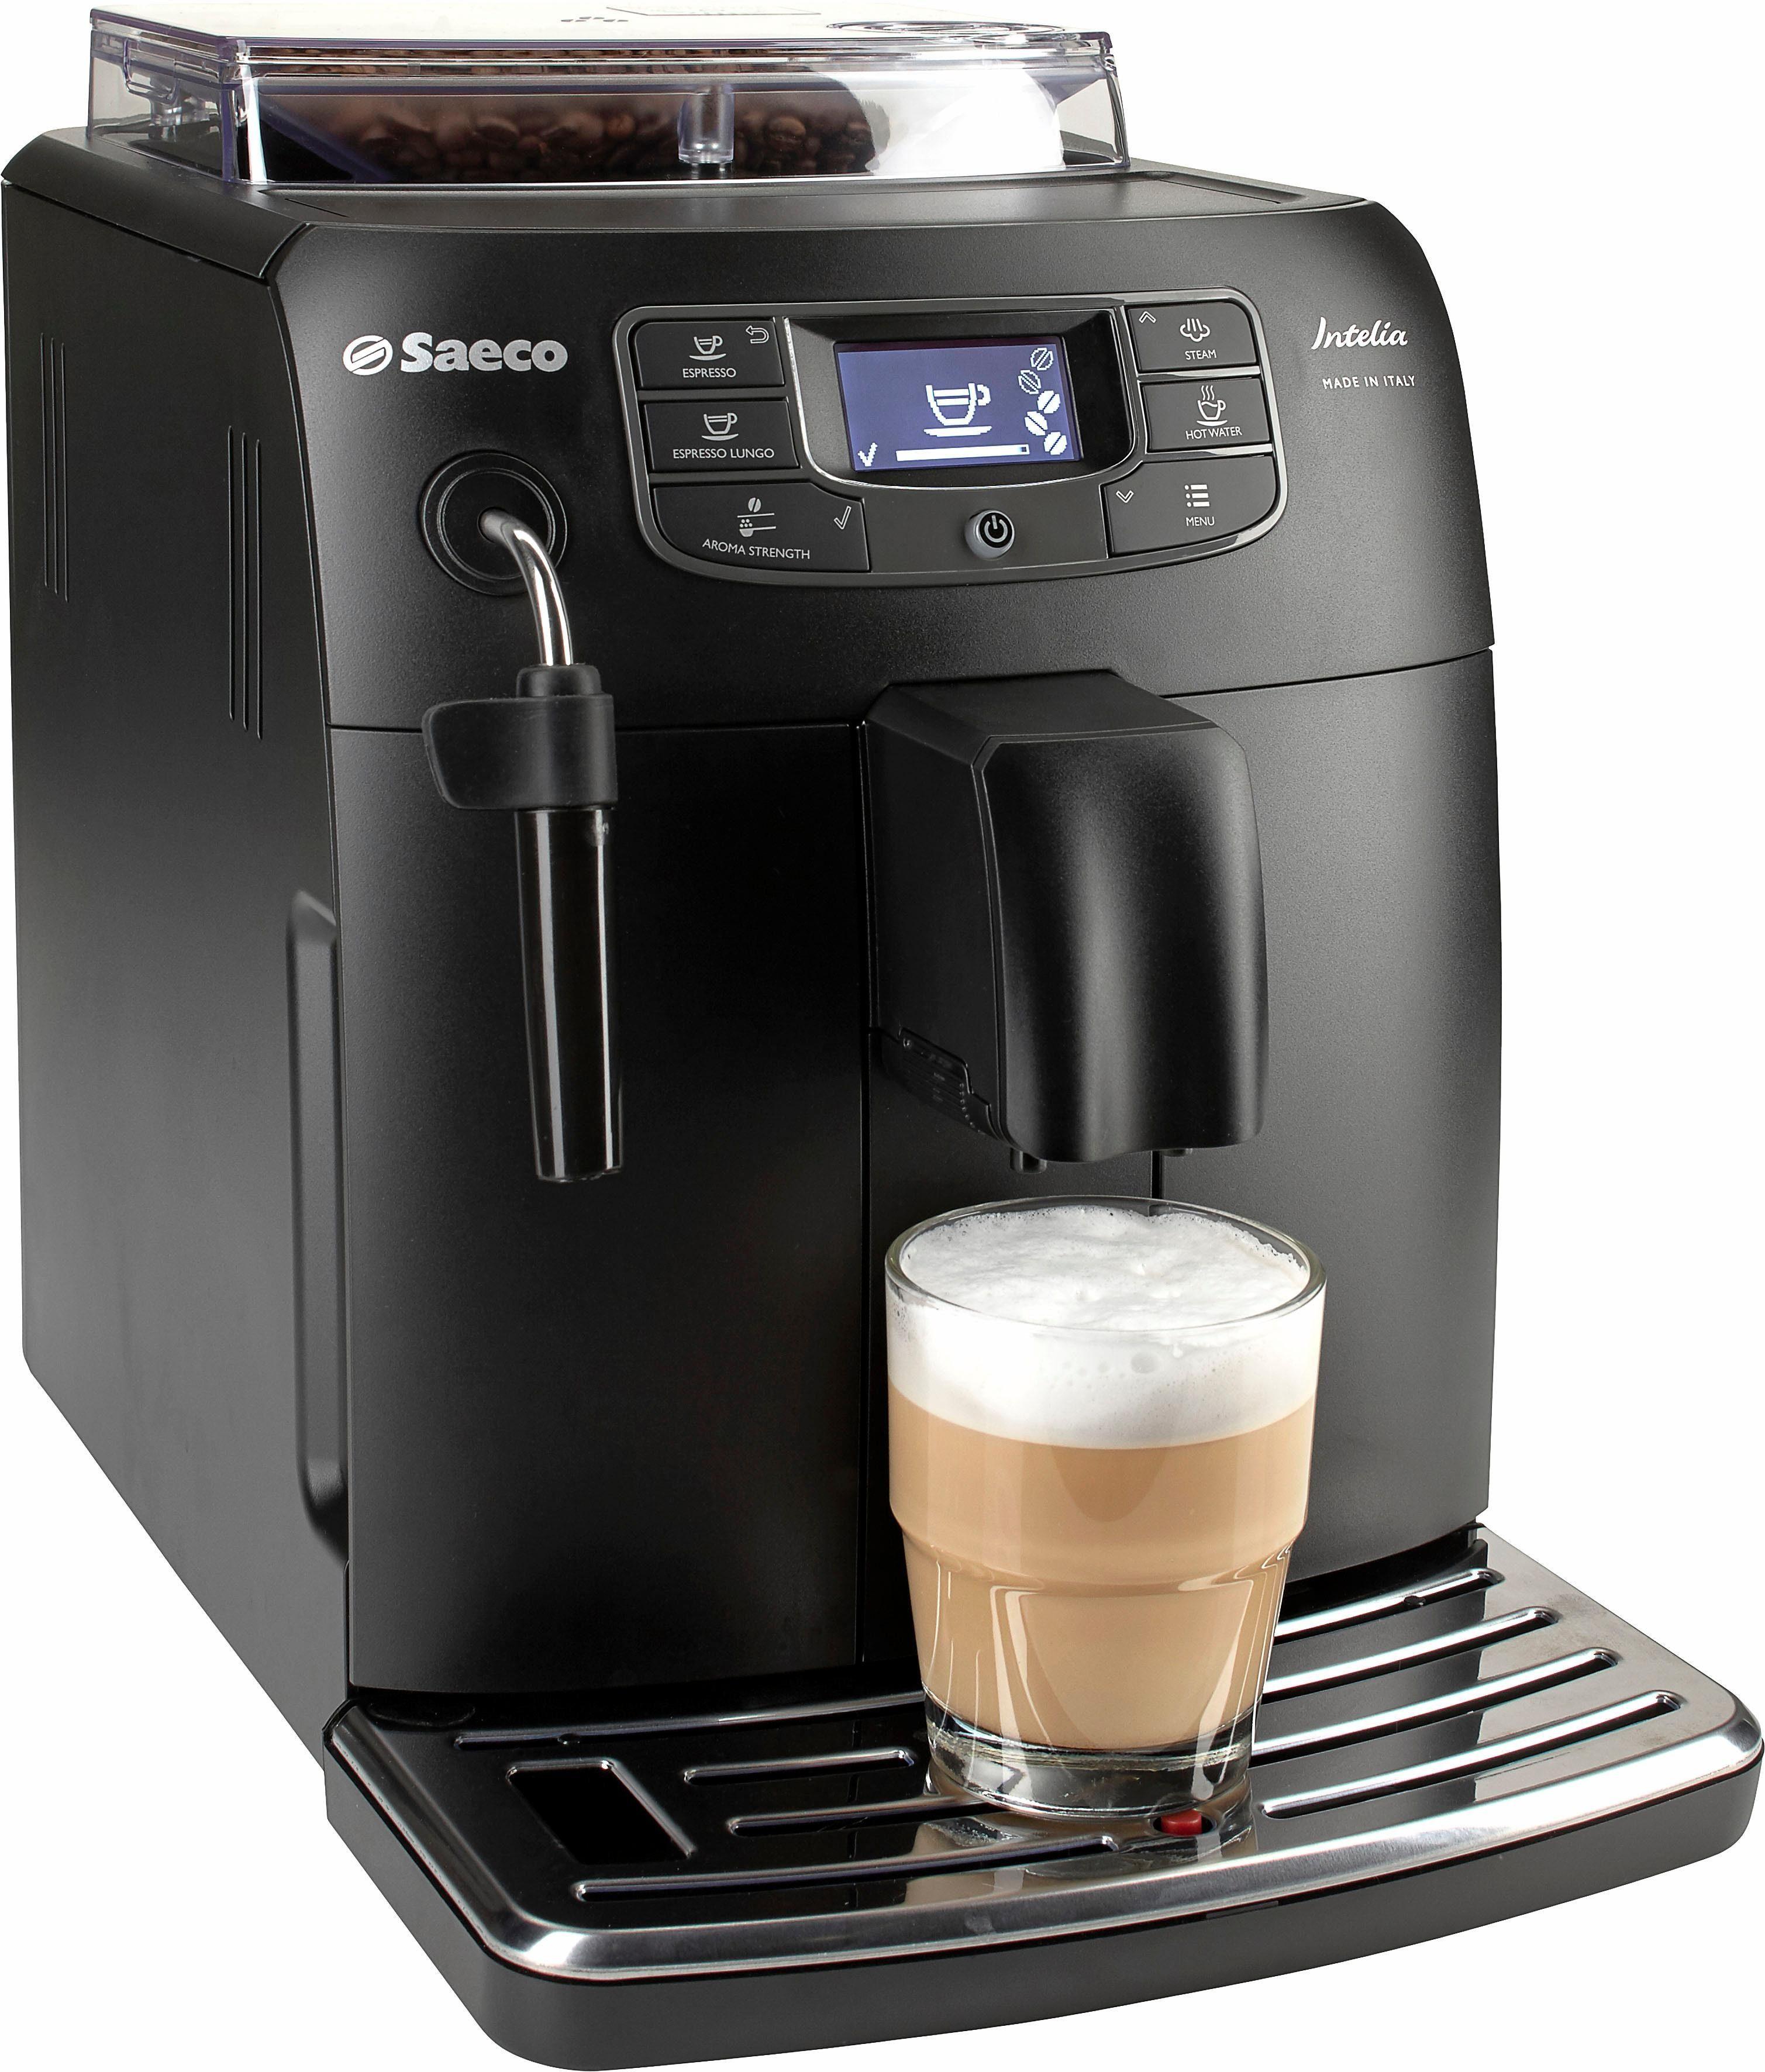 Saeco Kaffeevollautomat HD8900/01 Intelia Deluxe, schwarz